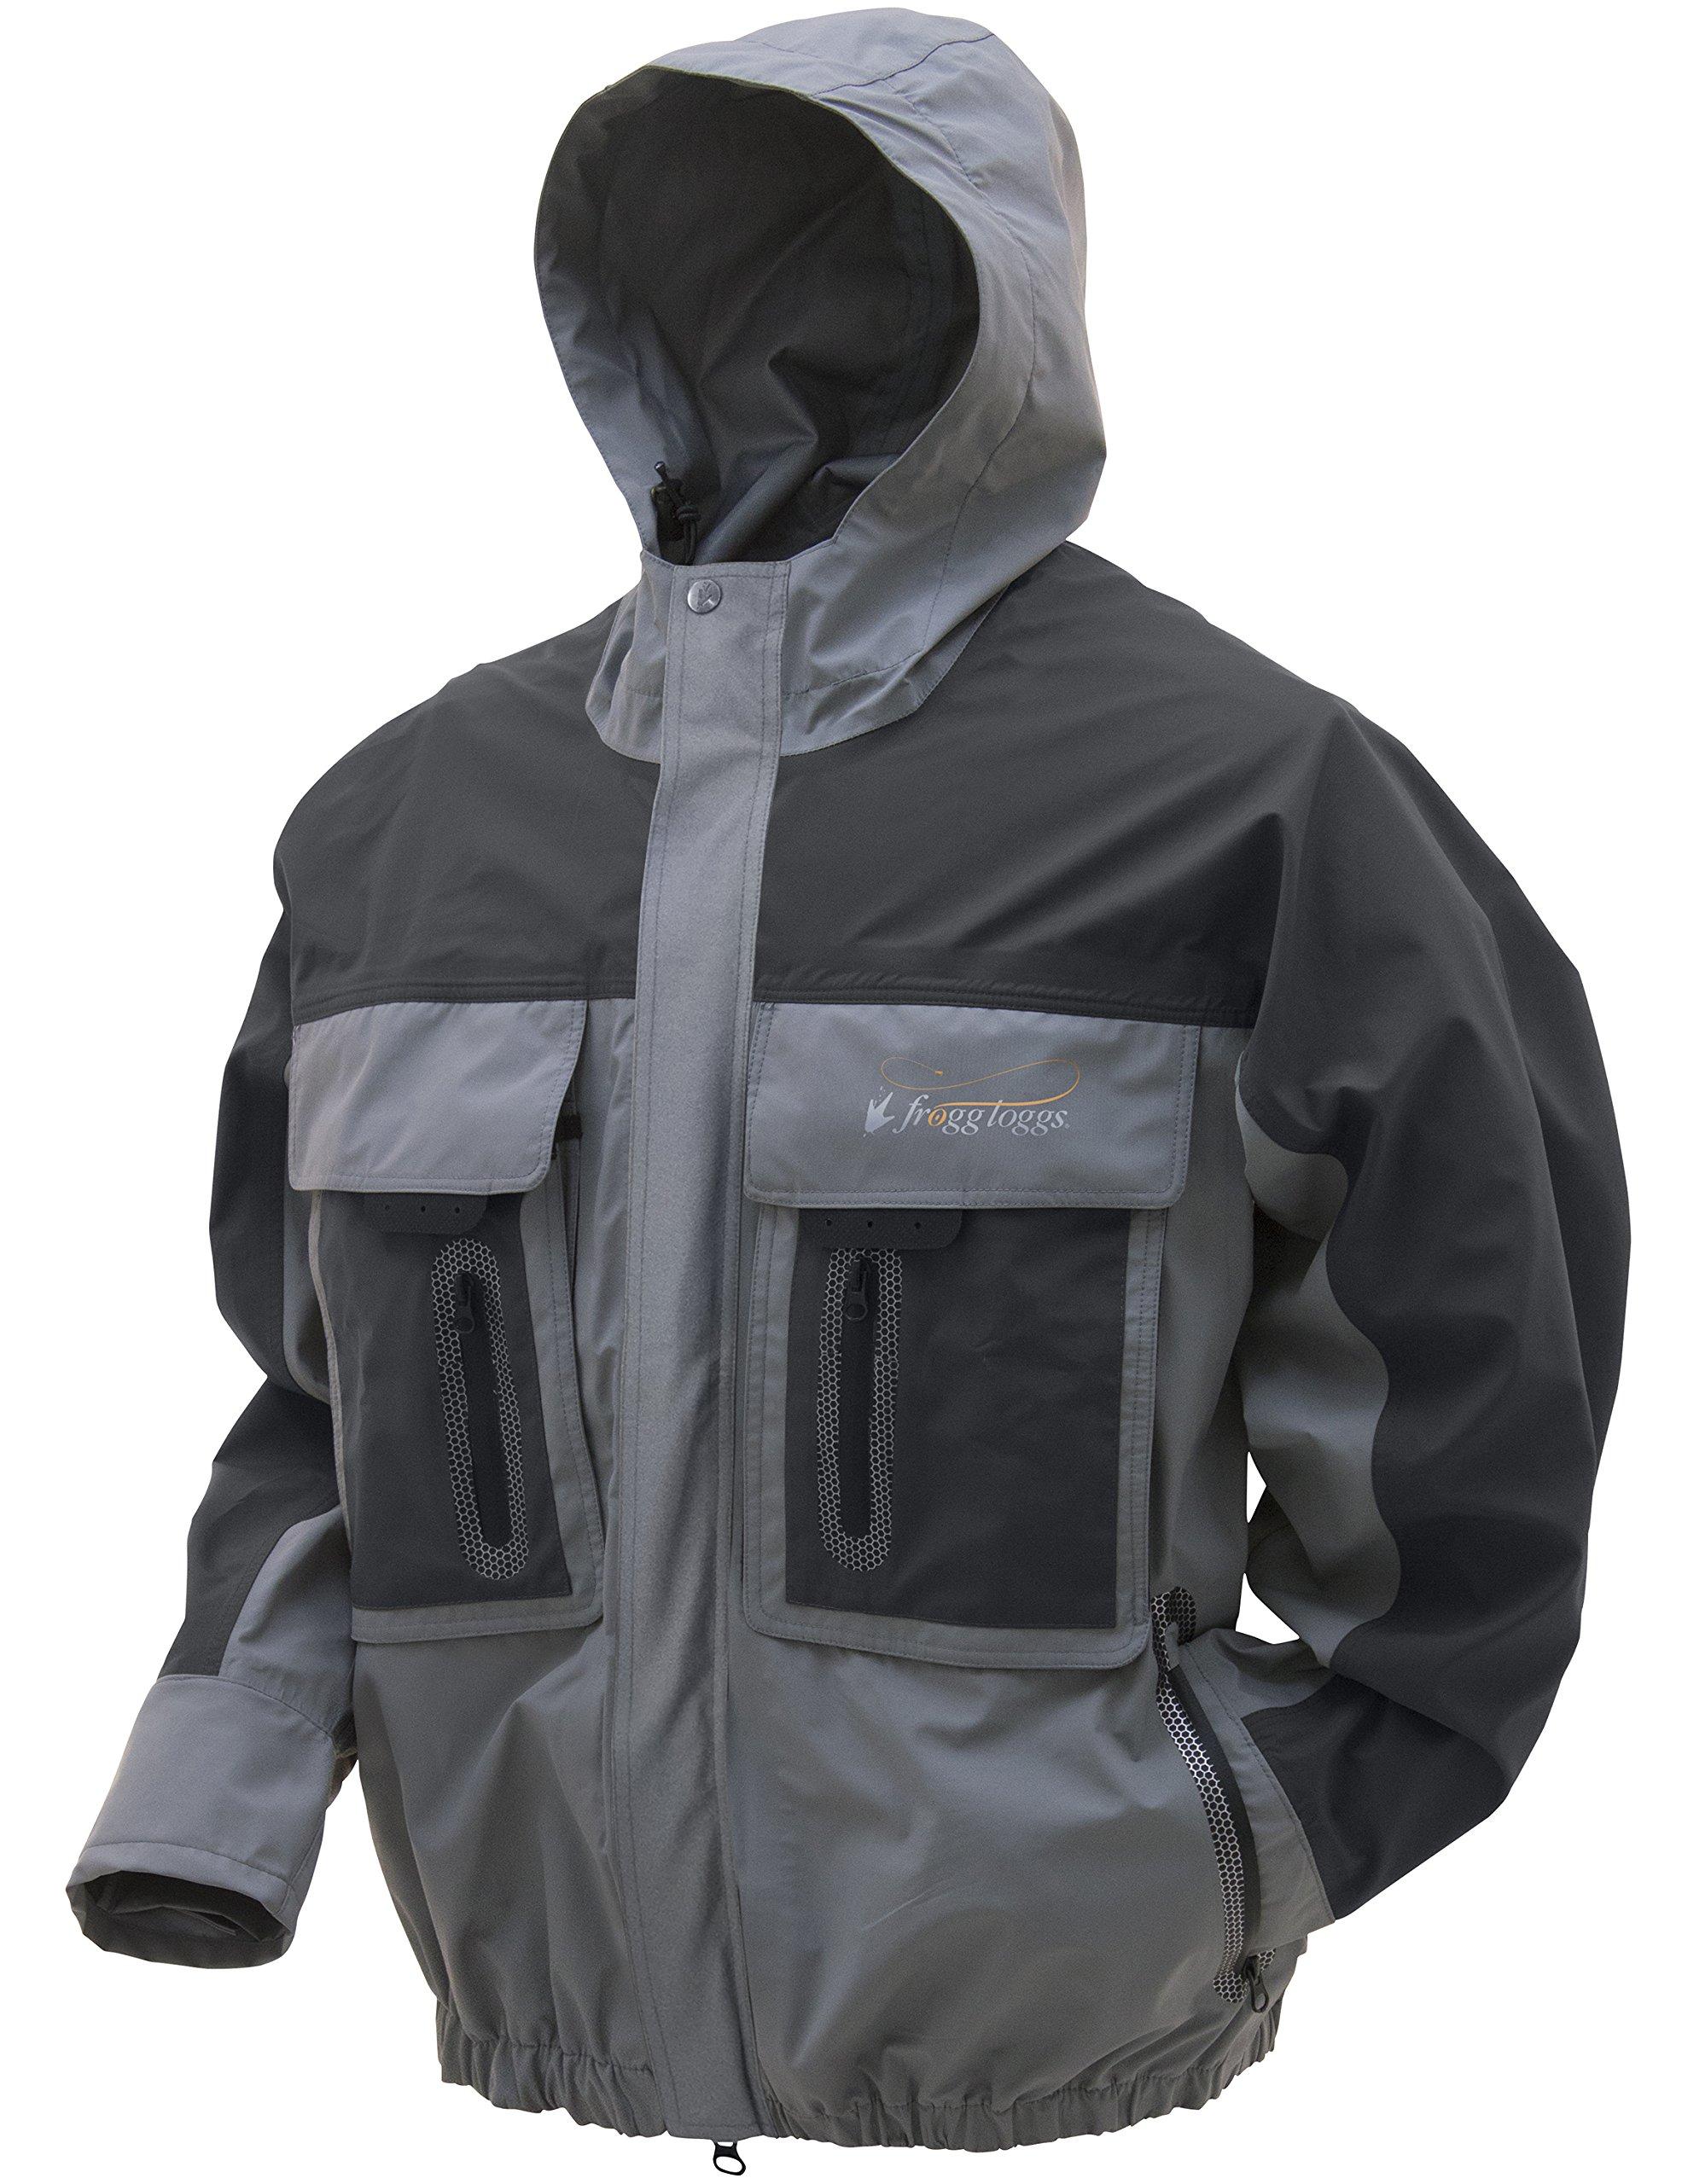 Frogg Toggs Pilot 3 Guide Rain Jacket, Slate/Gray, Size XX-Large